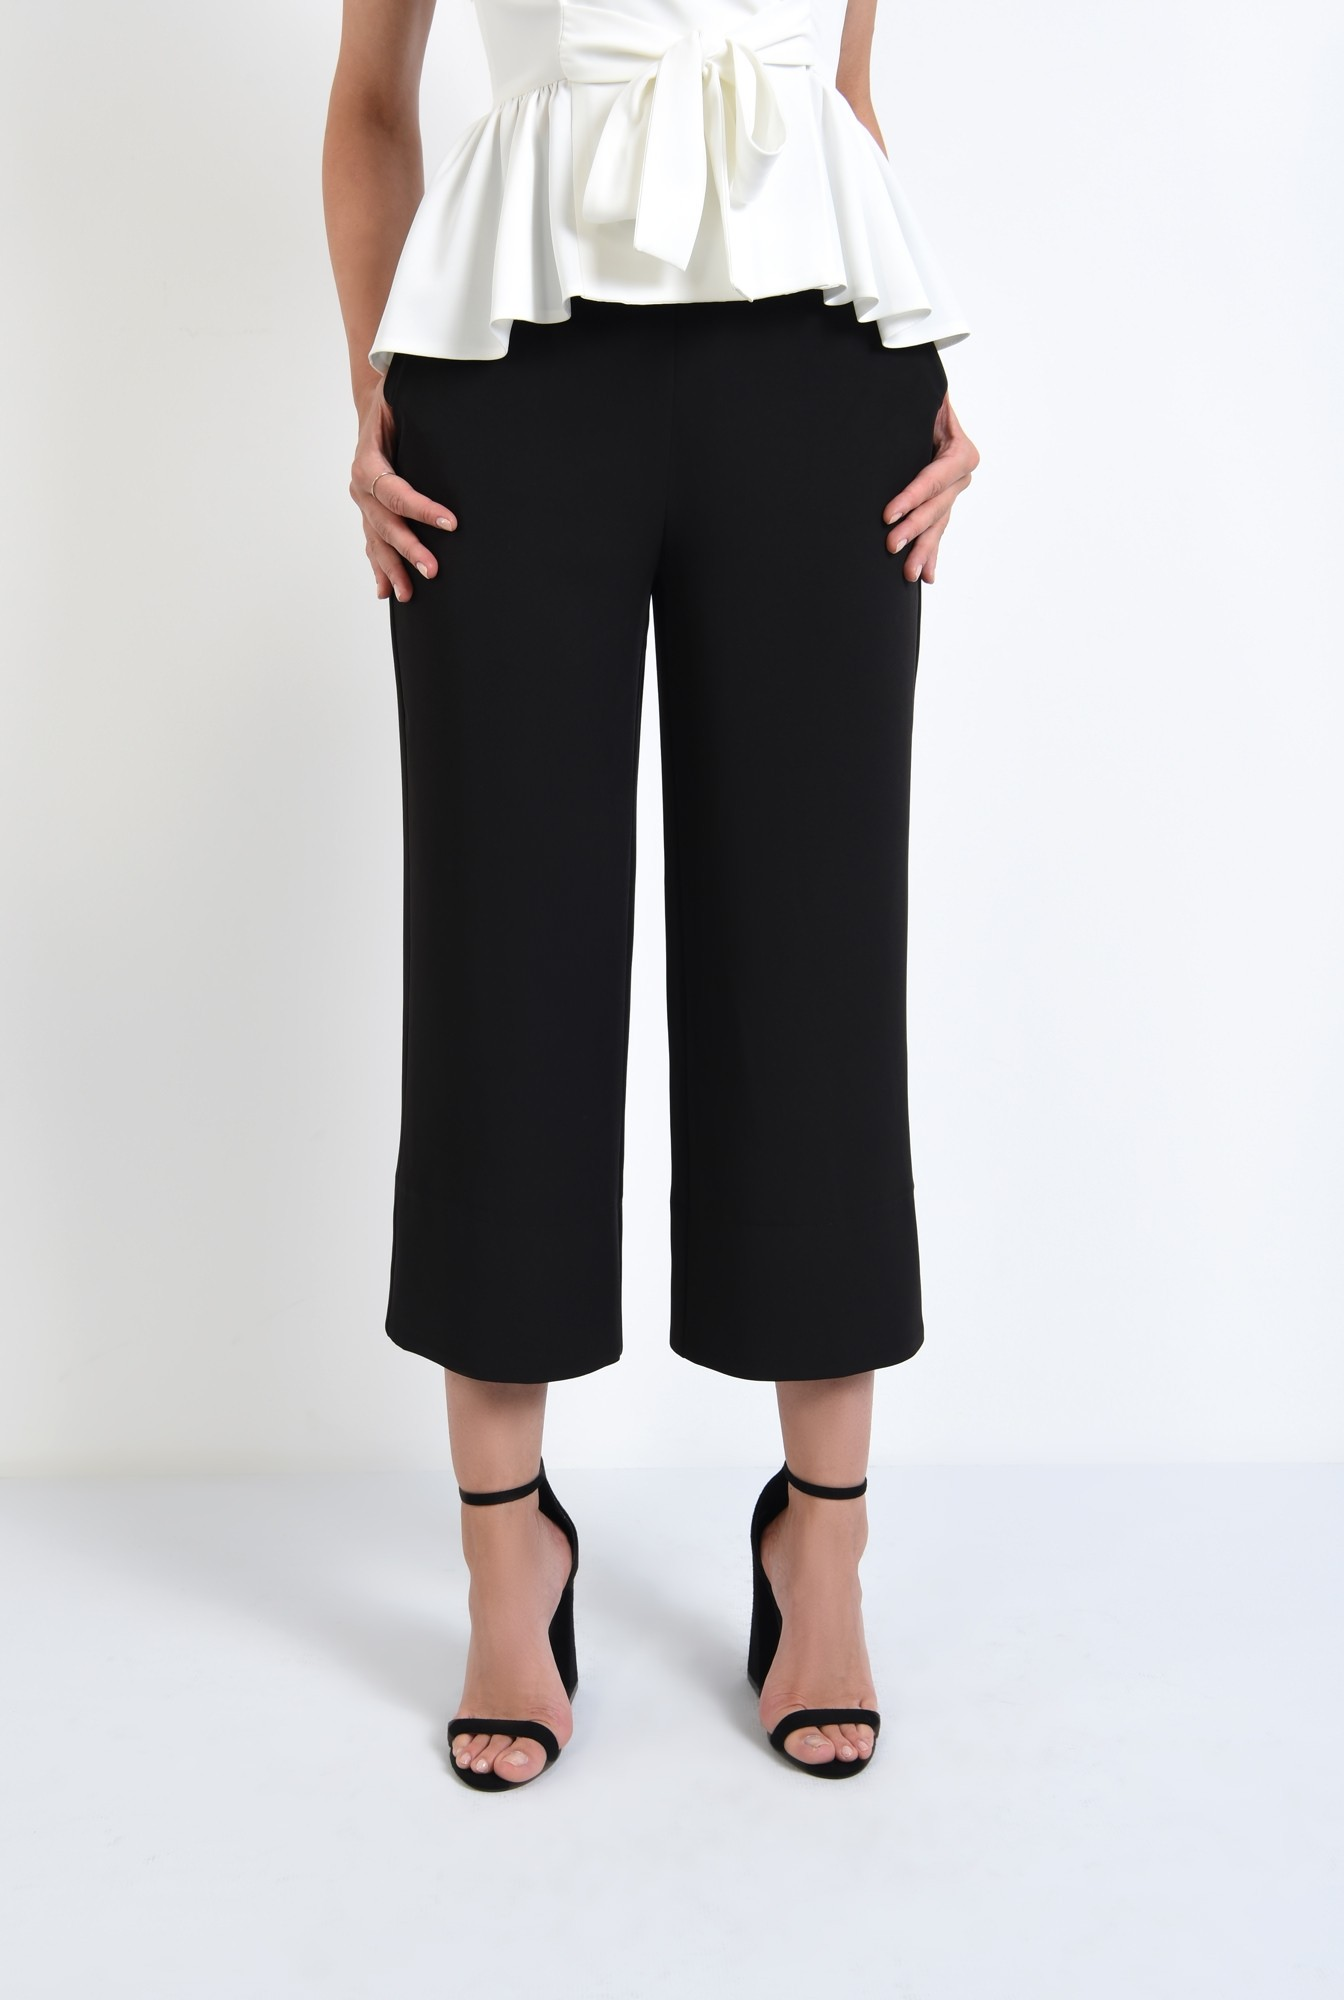 2 - 360 - pantaloni eleganti drepti, wide leg, buzunare functionale